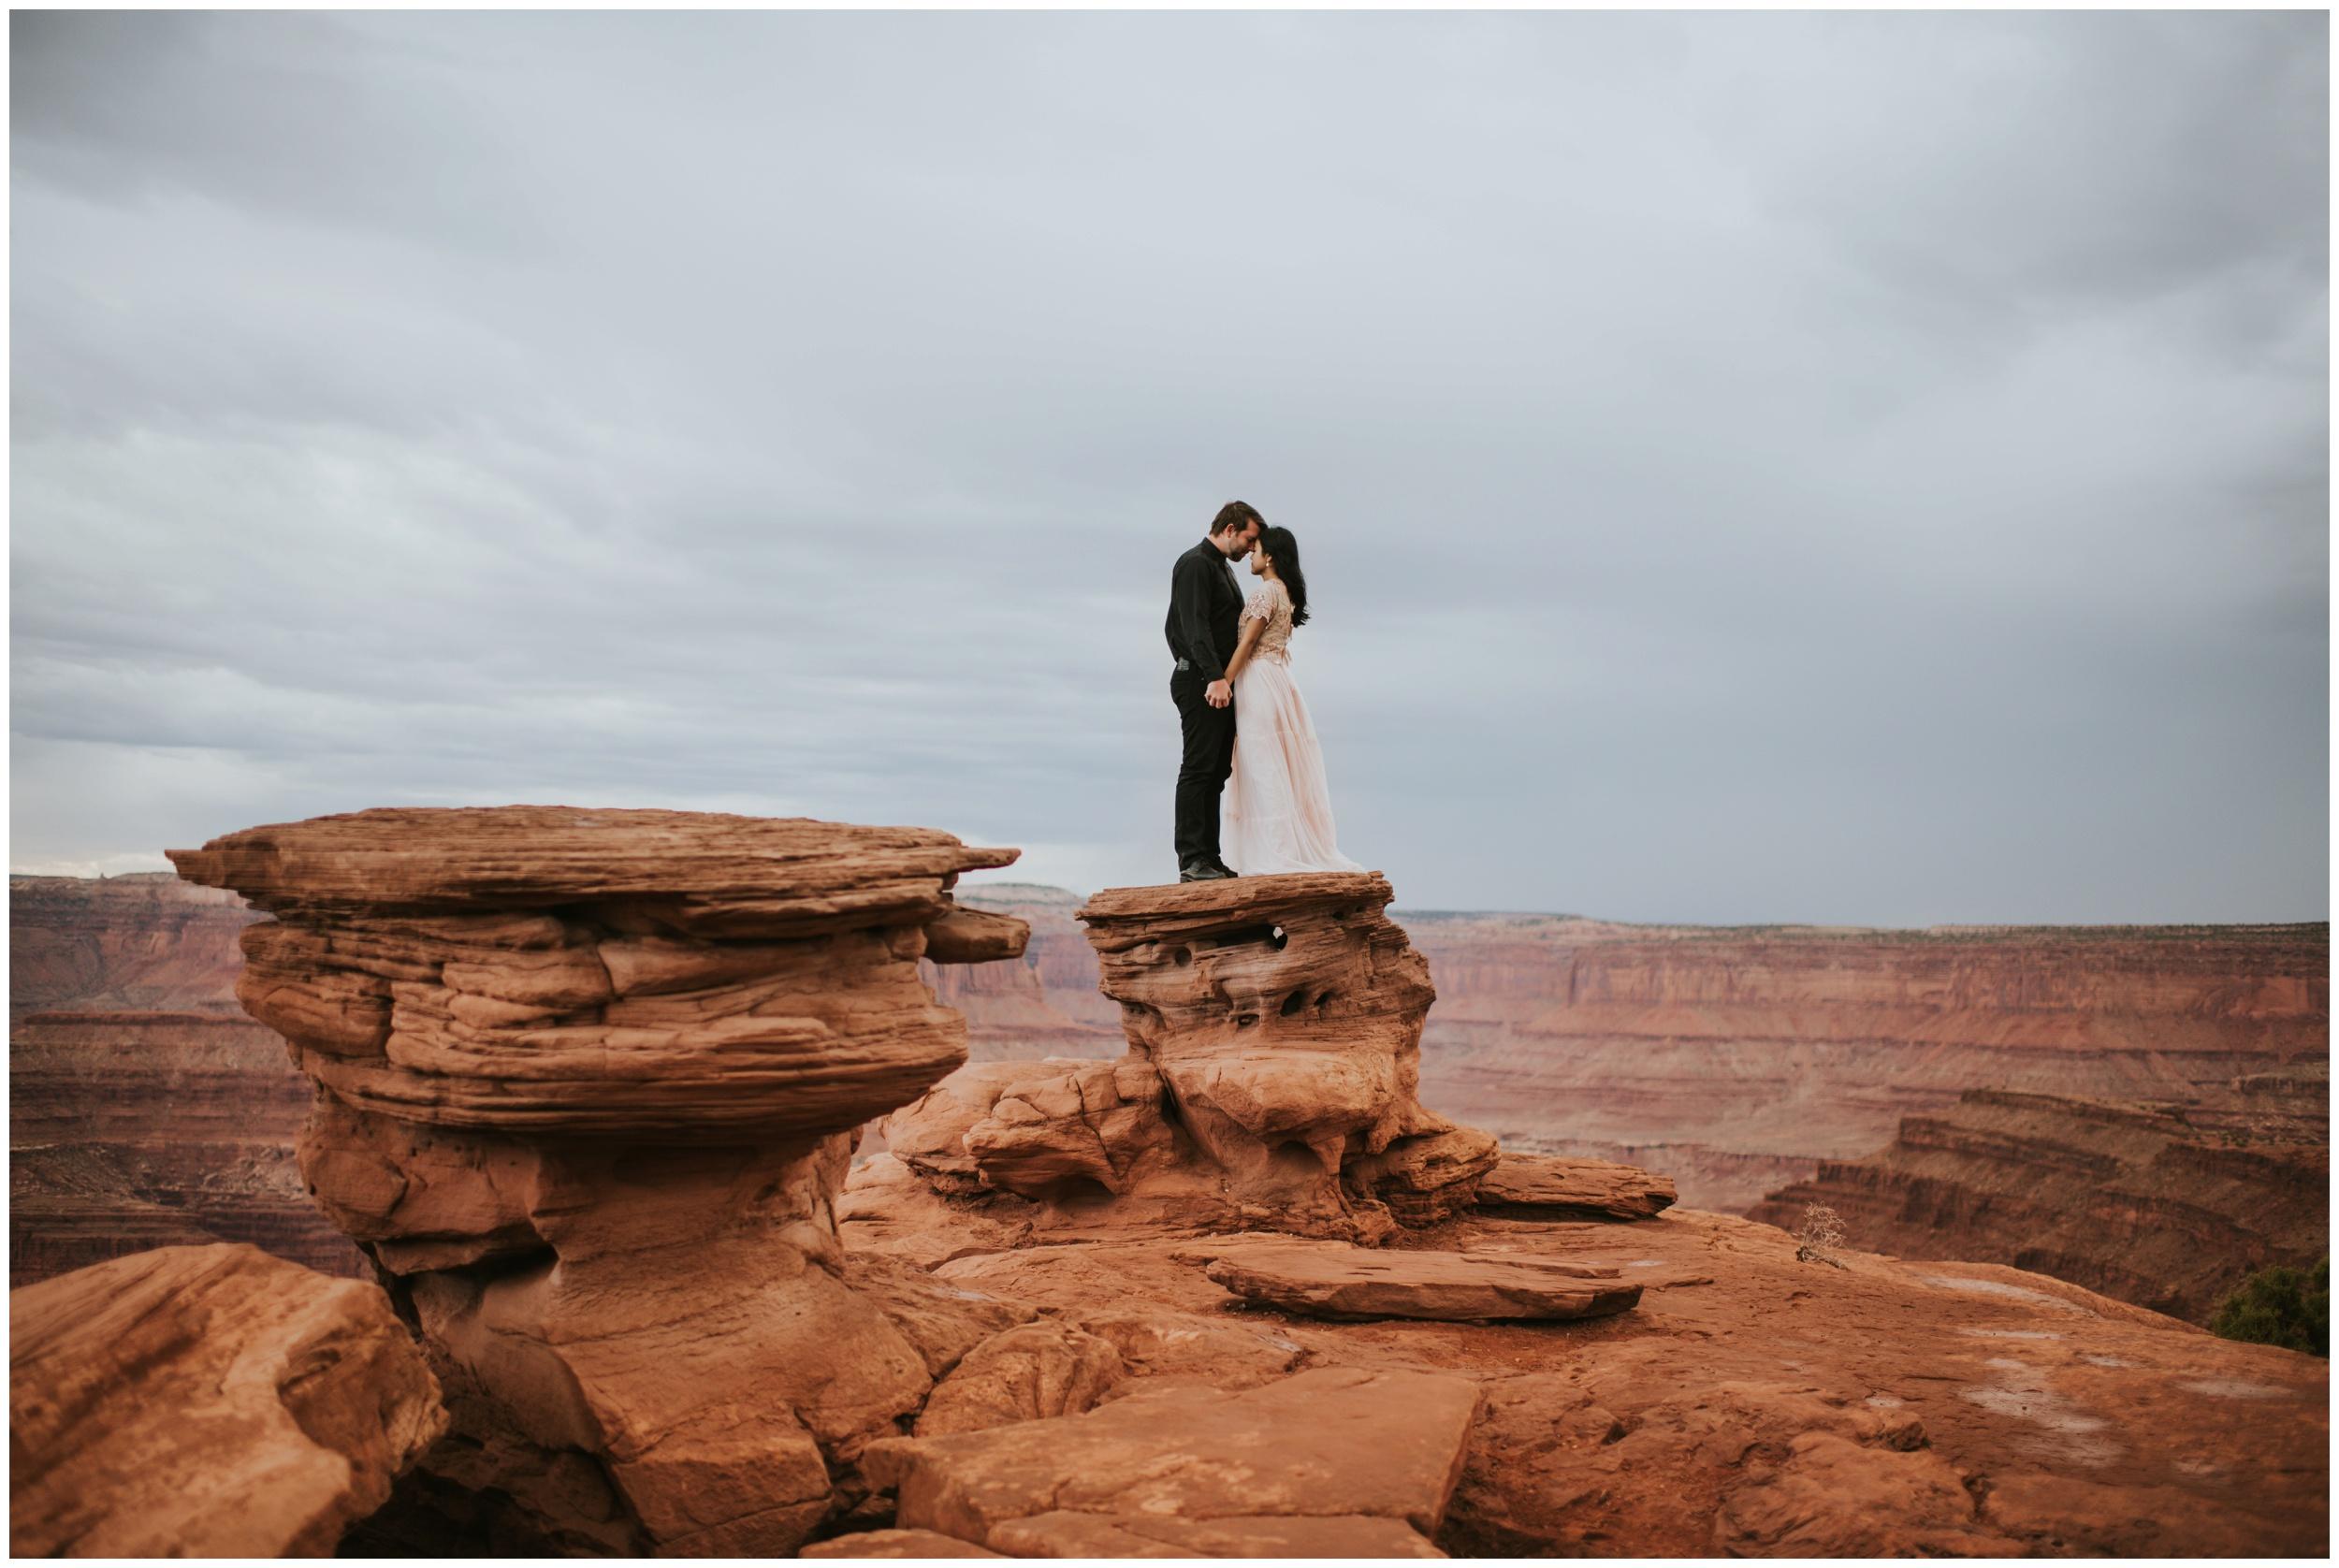 Beautiful landscape portrait of couple eloping at Dead Horse Point | Elopement Photographer www.riversandroadsphotography.com